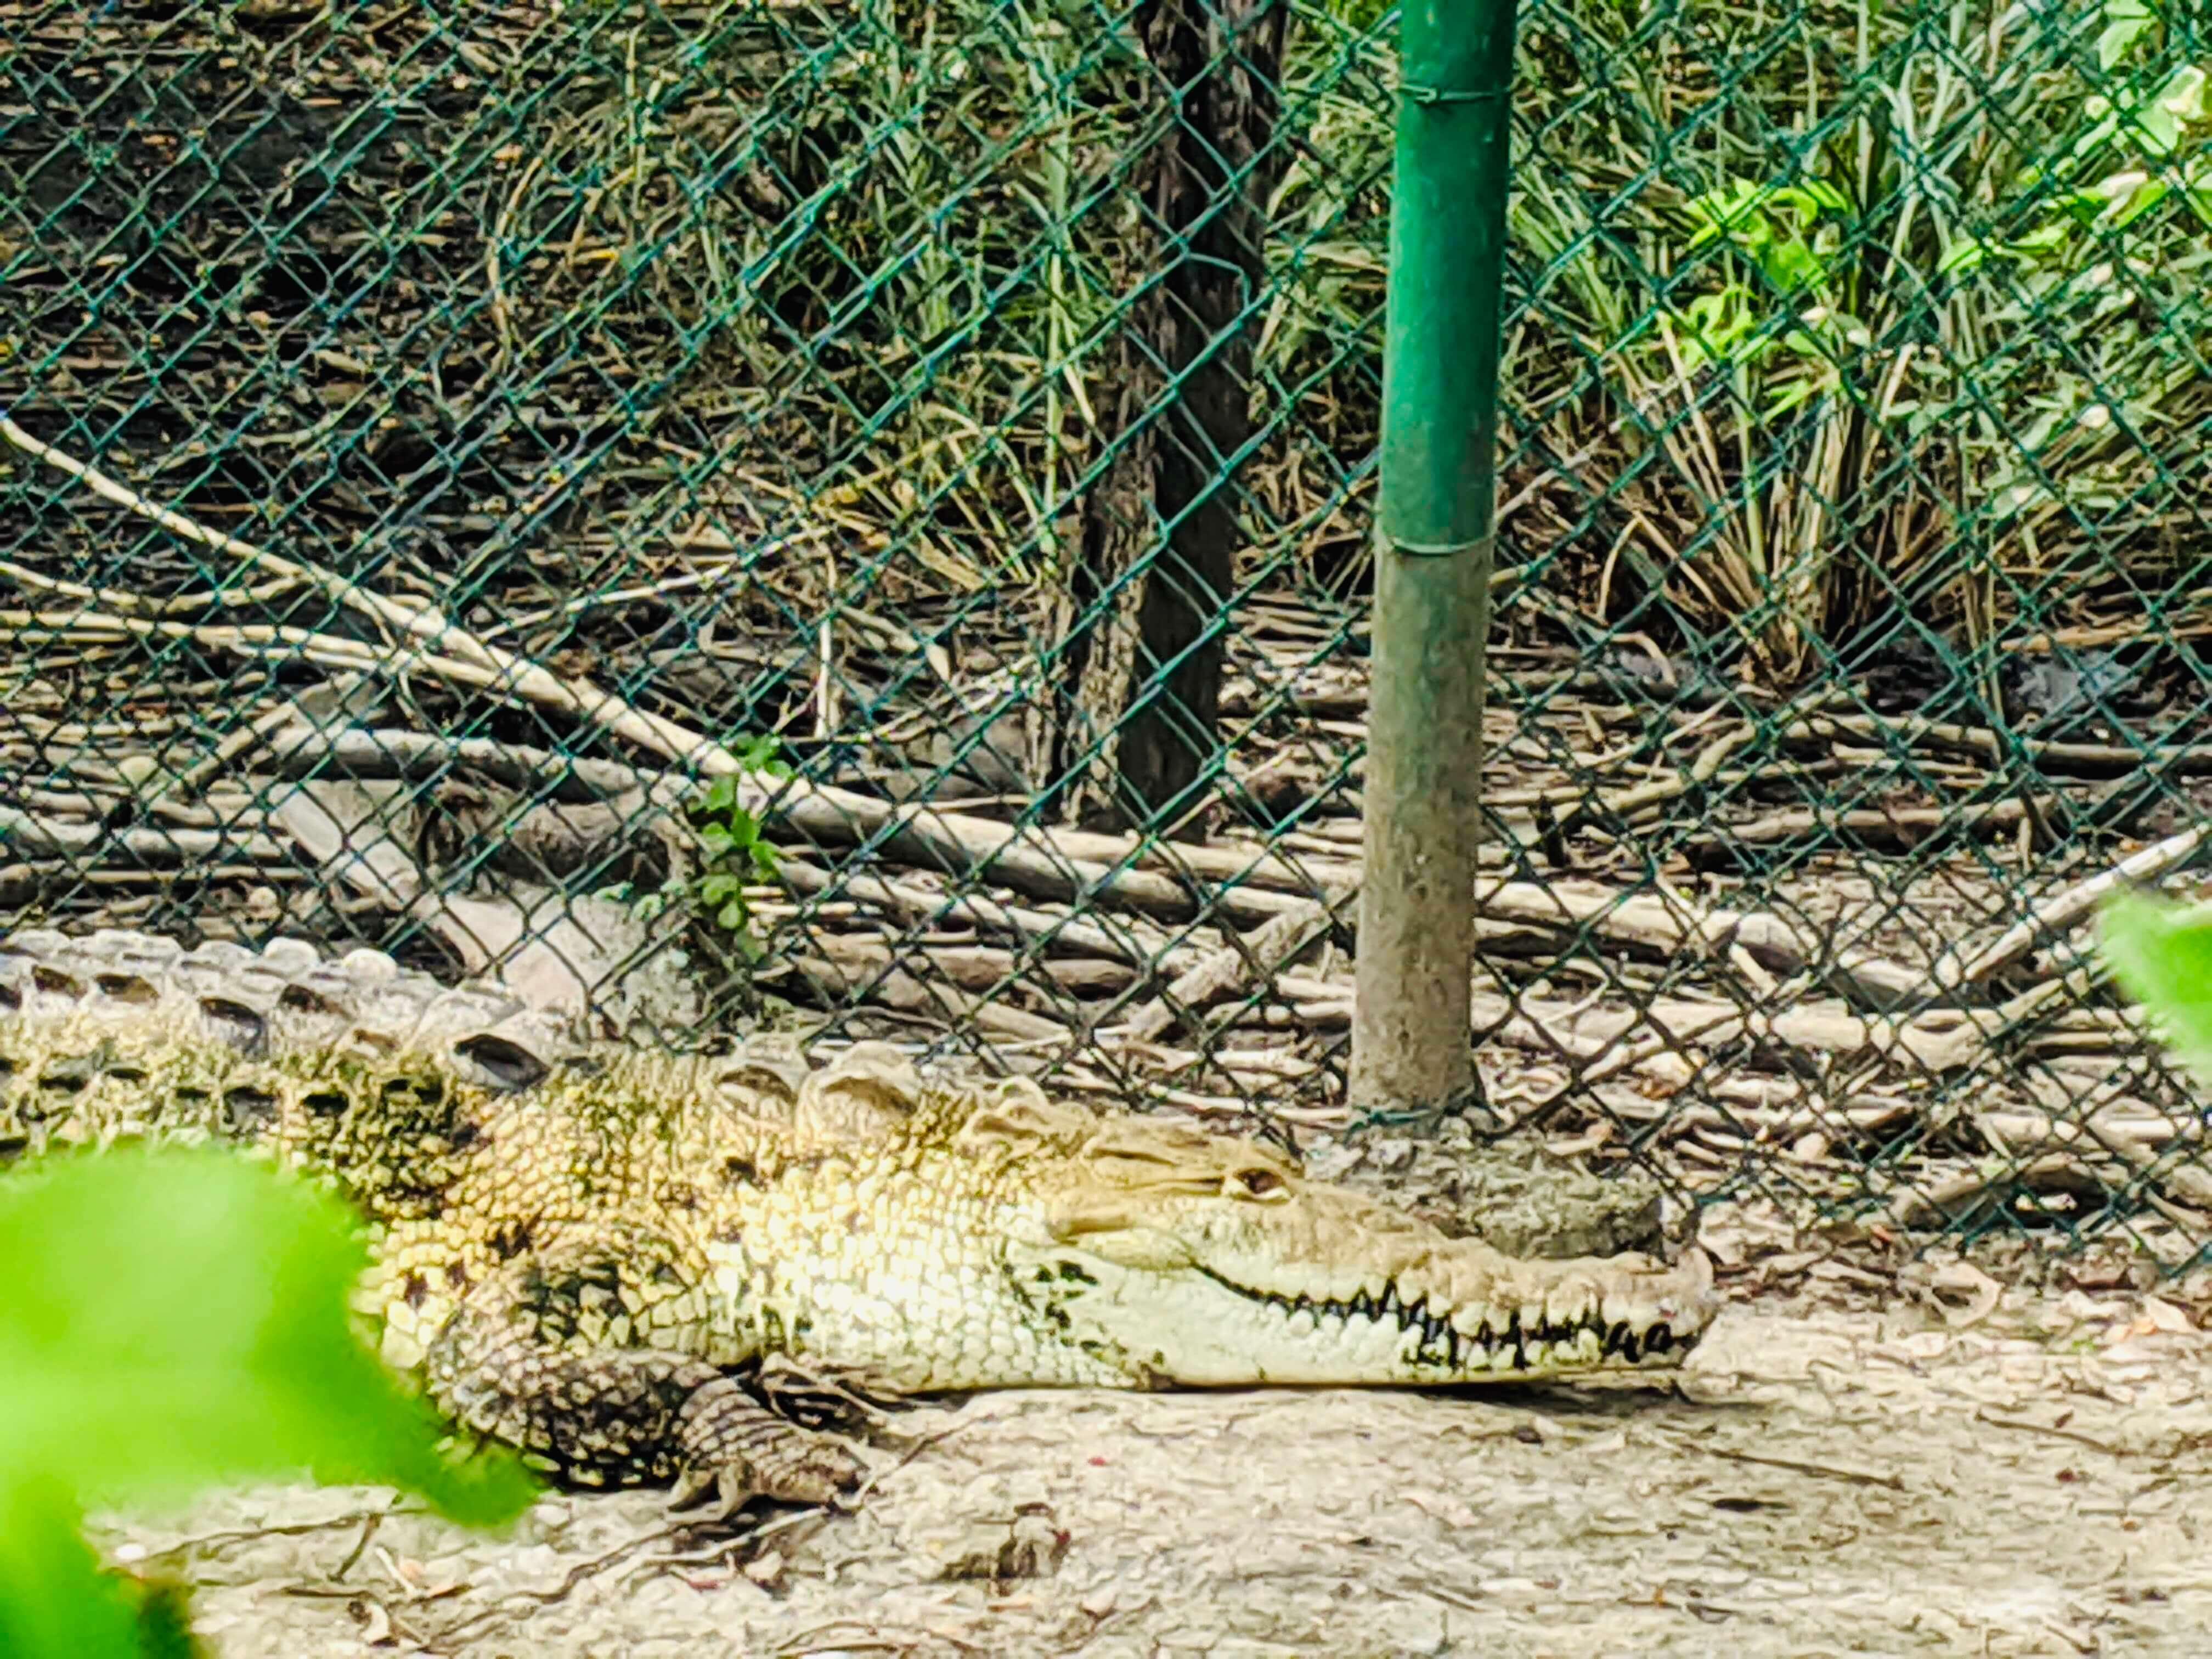 The 36 year old, blind crocodile, Esperenza